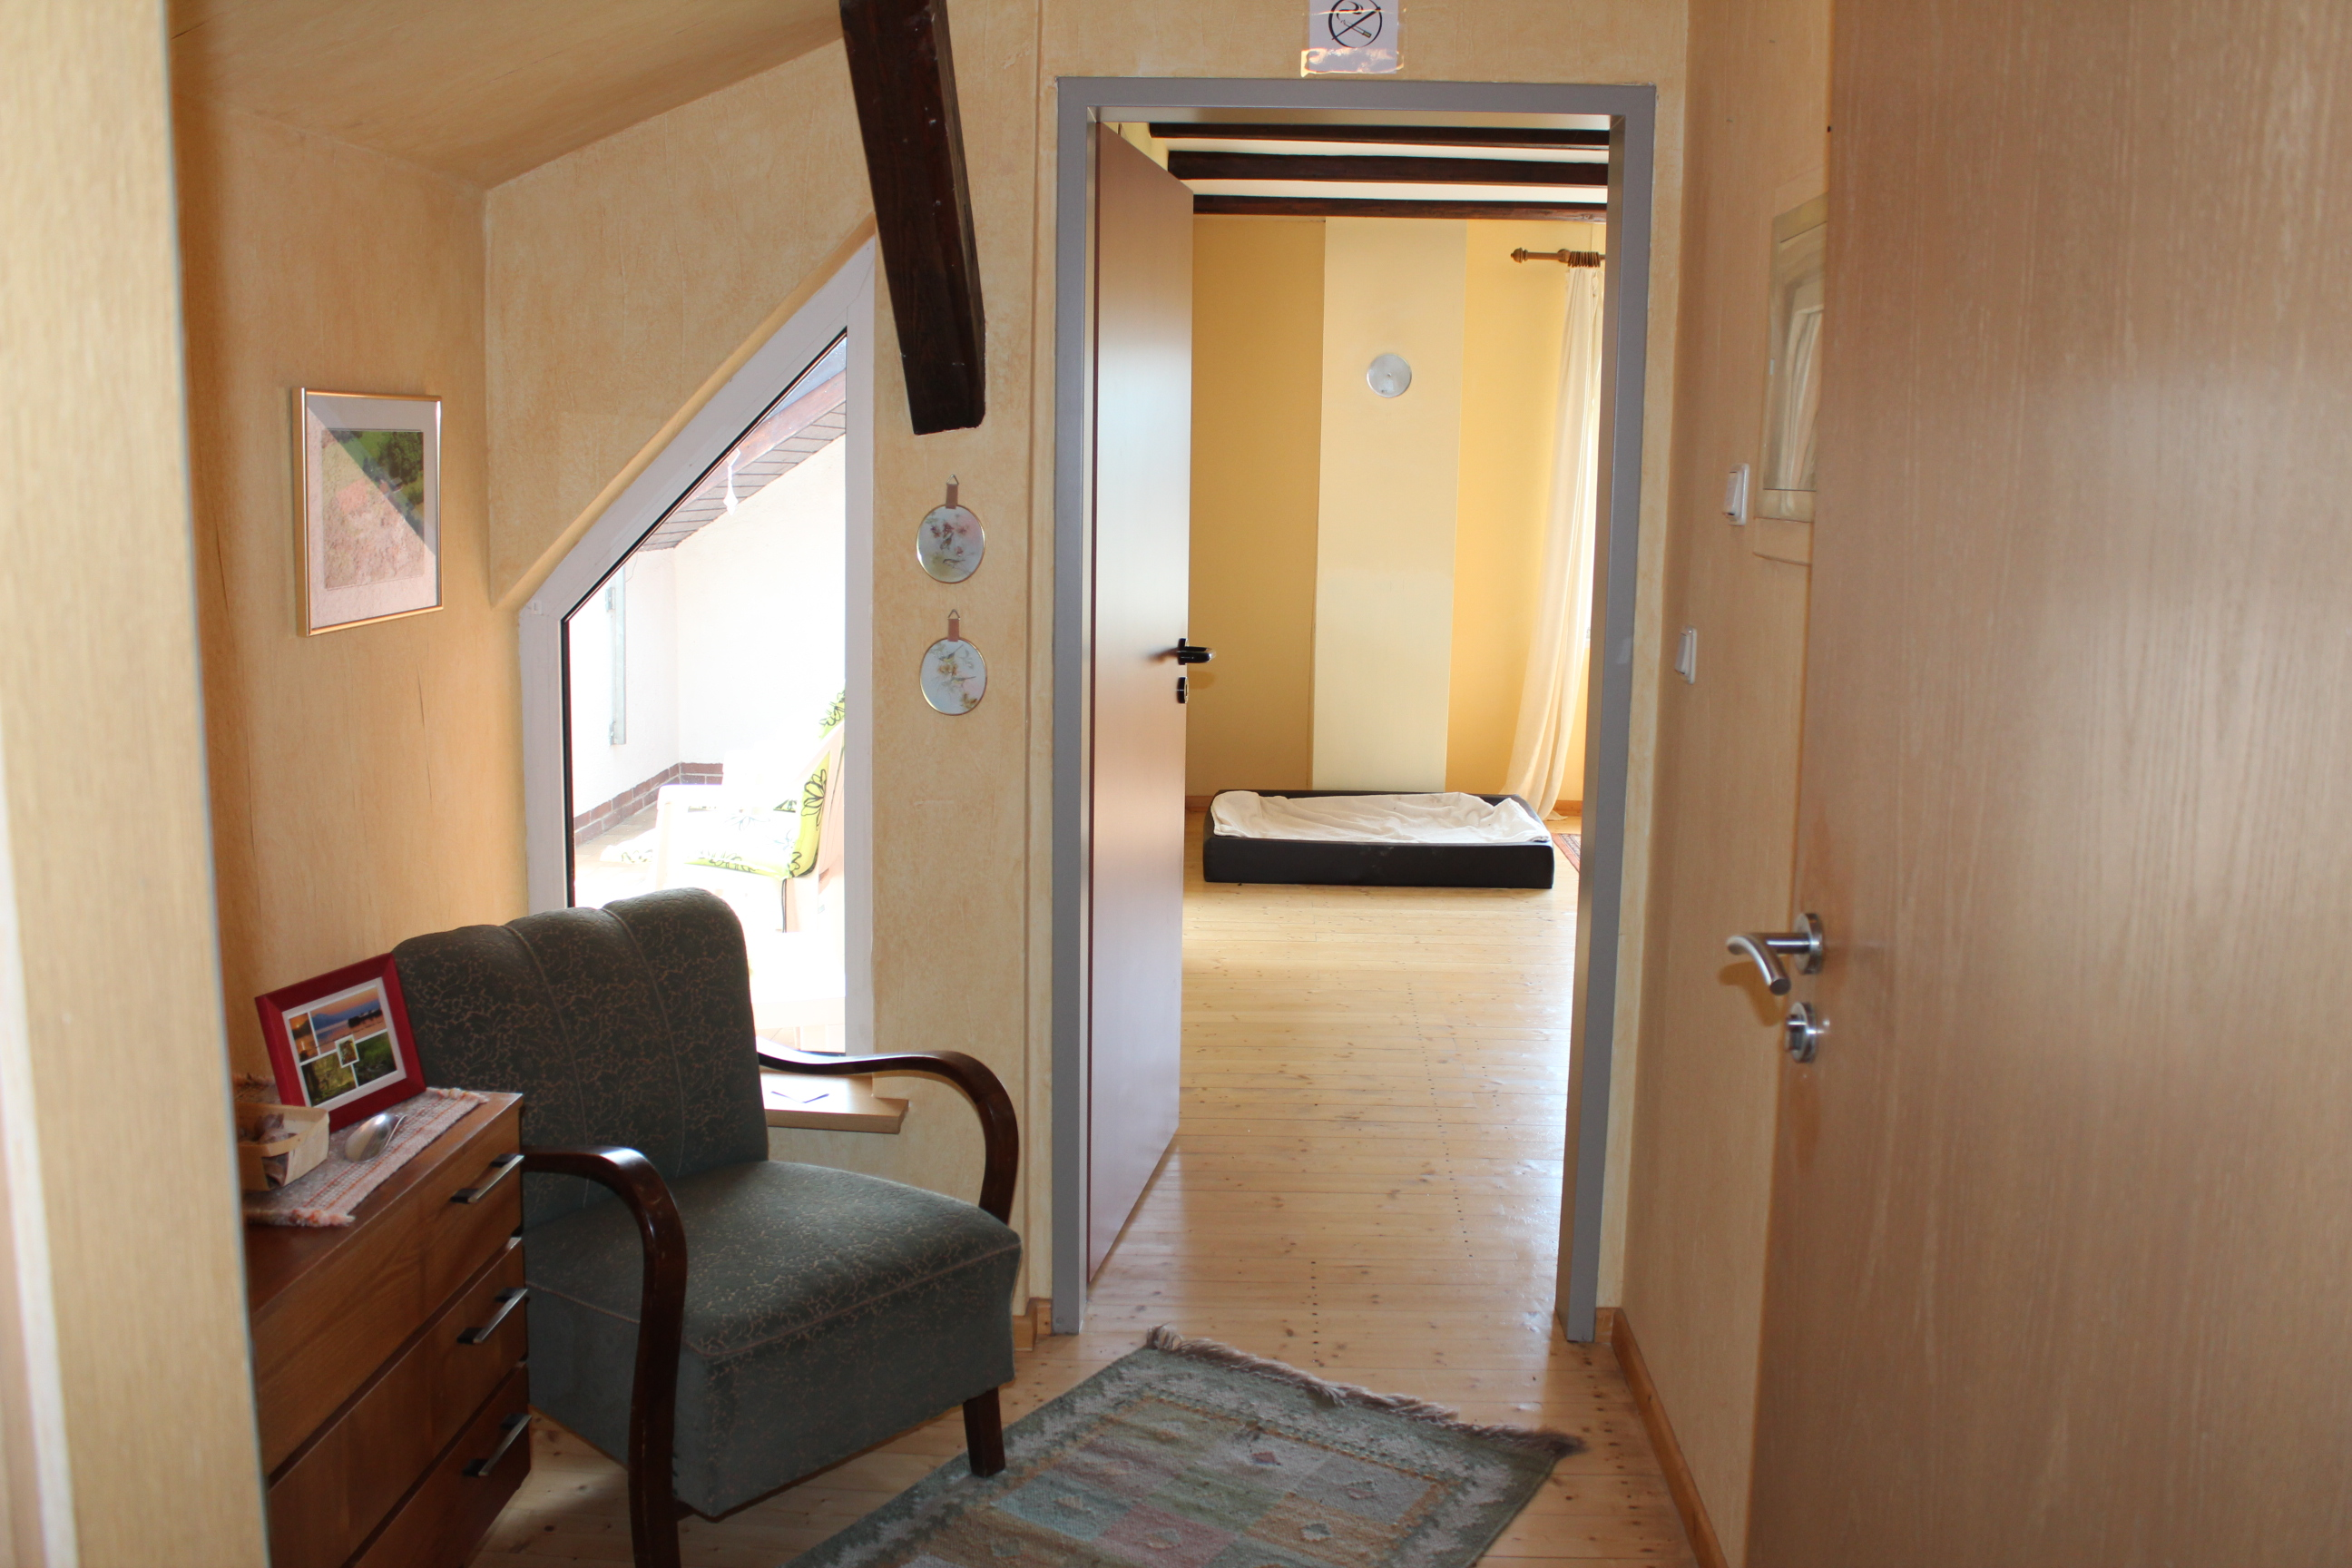 wohnung 70m dachgeschoss puckels pension. Black Bedroom Furniture Sets. Home Design Ideas